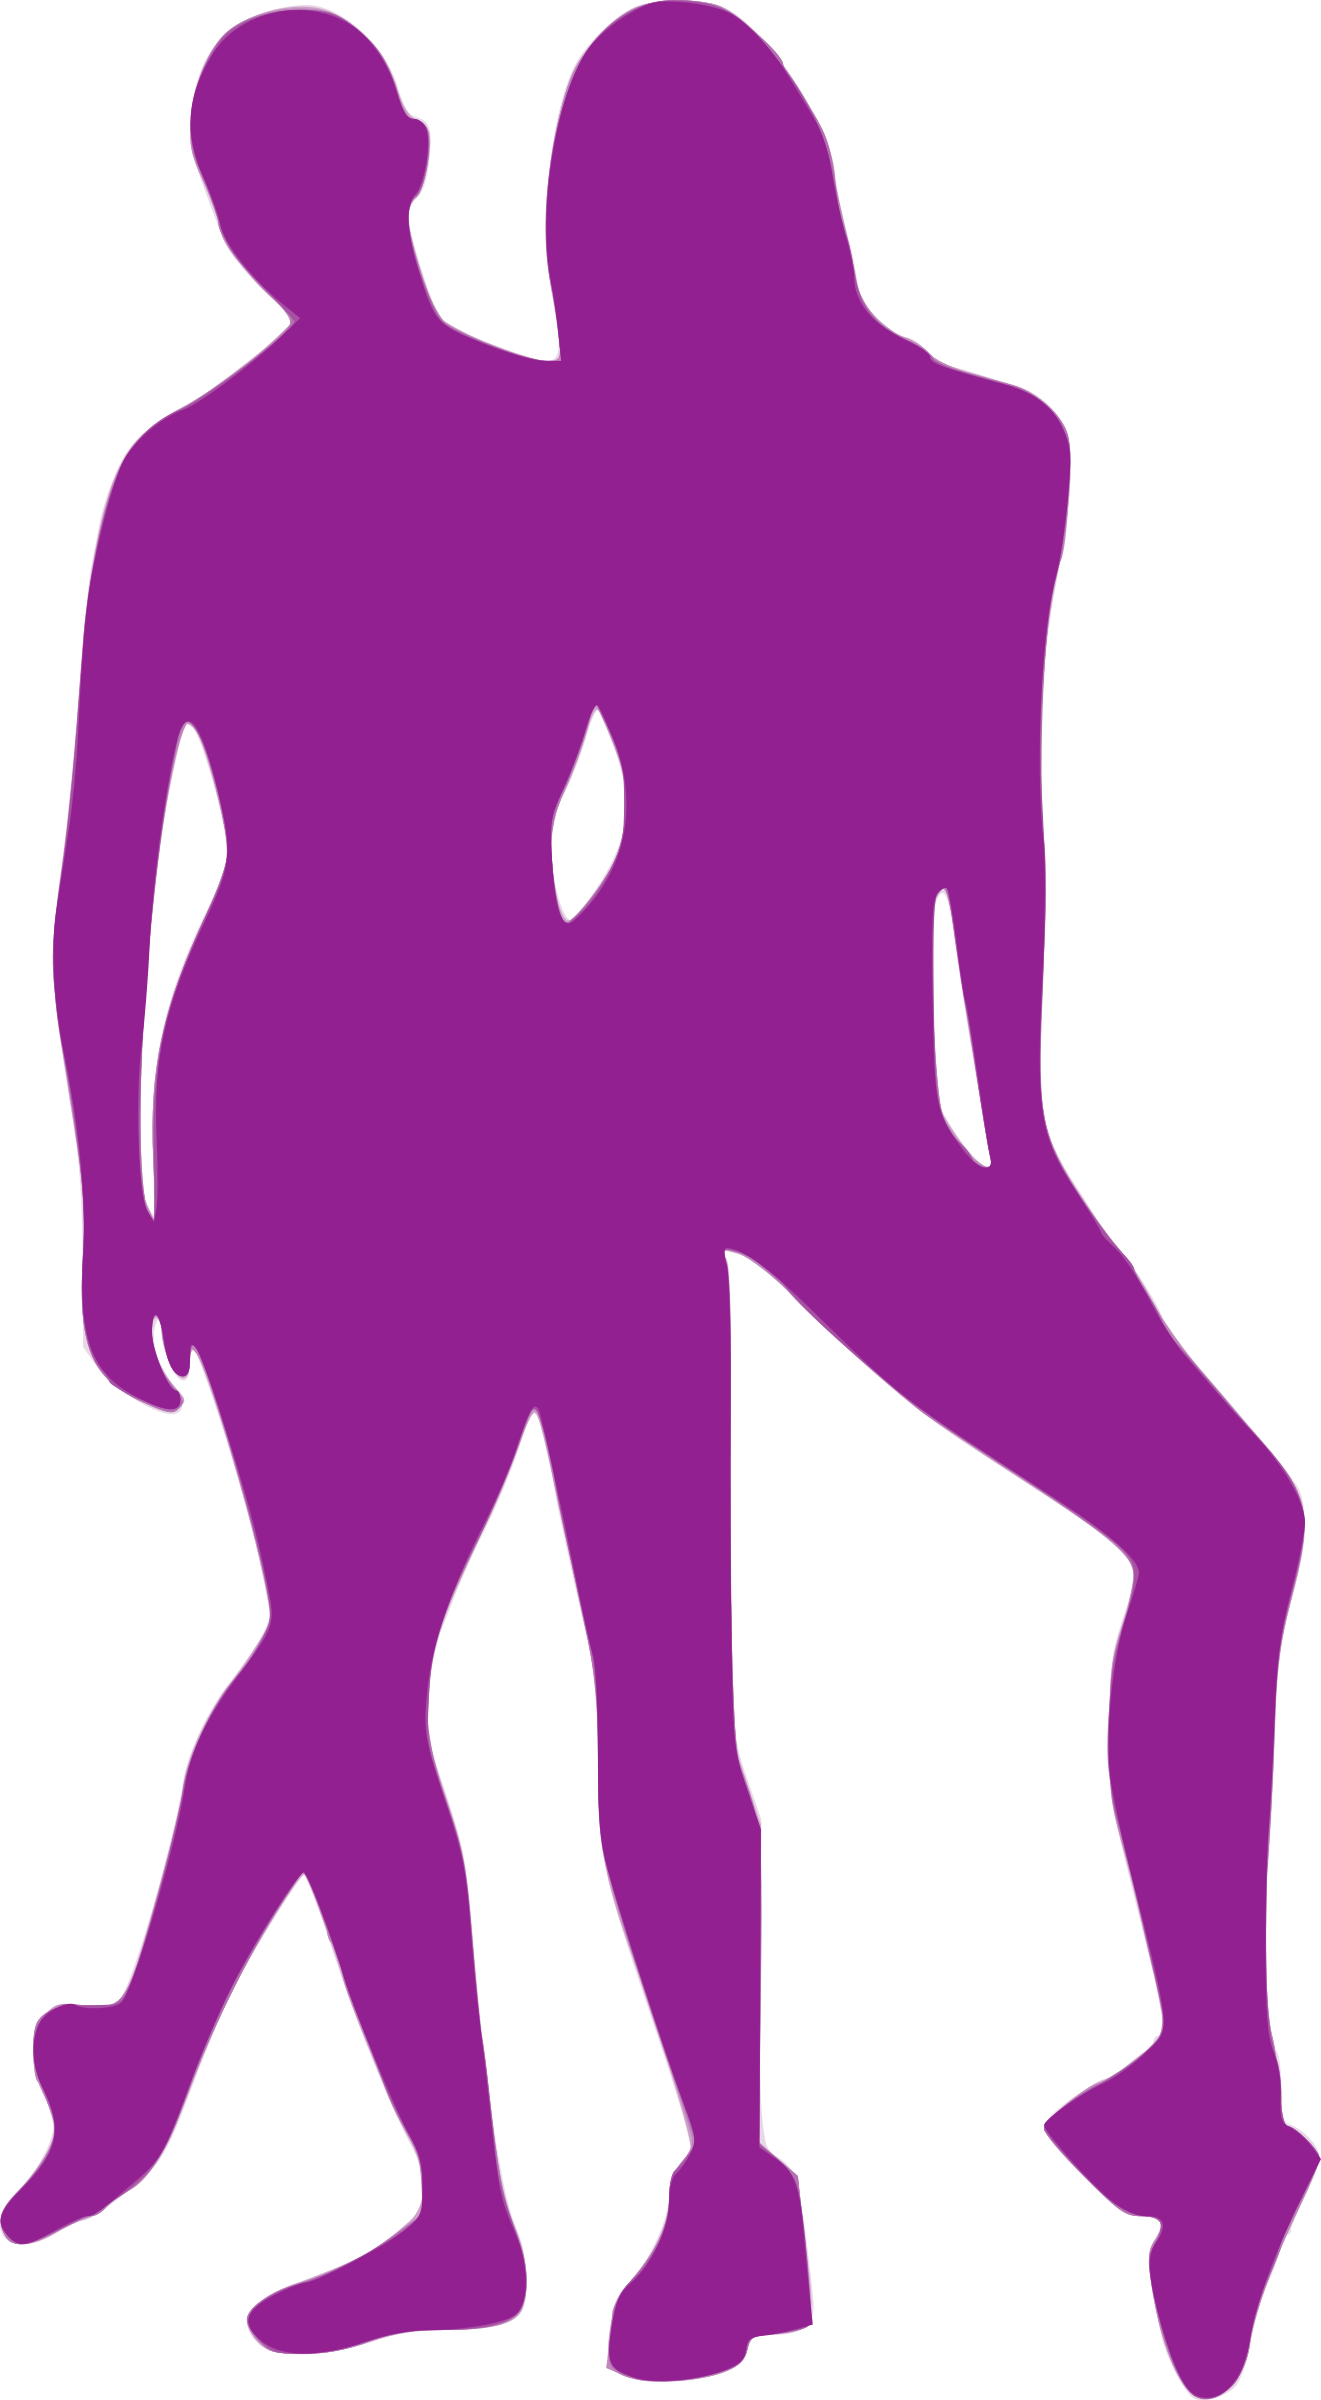 Danse clipart silhouette BIG Silhouette IMAGE Clipart 35